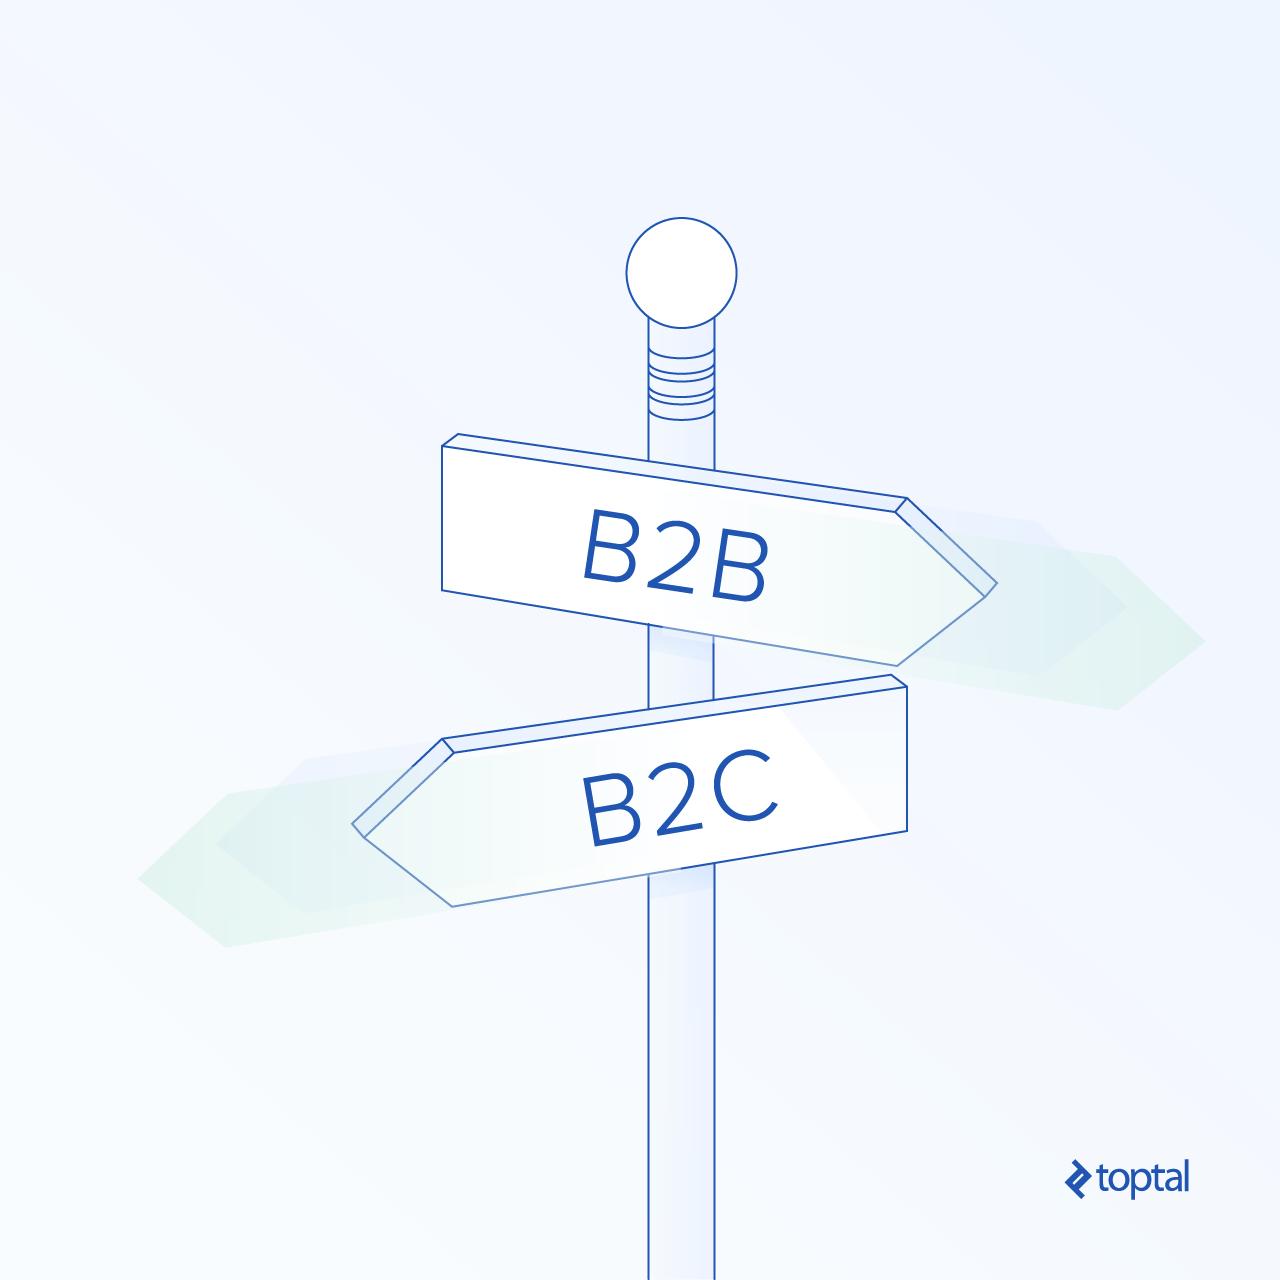 b2b or b2c pricing